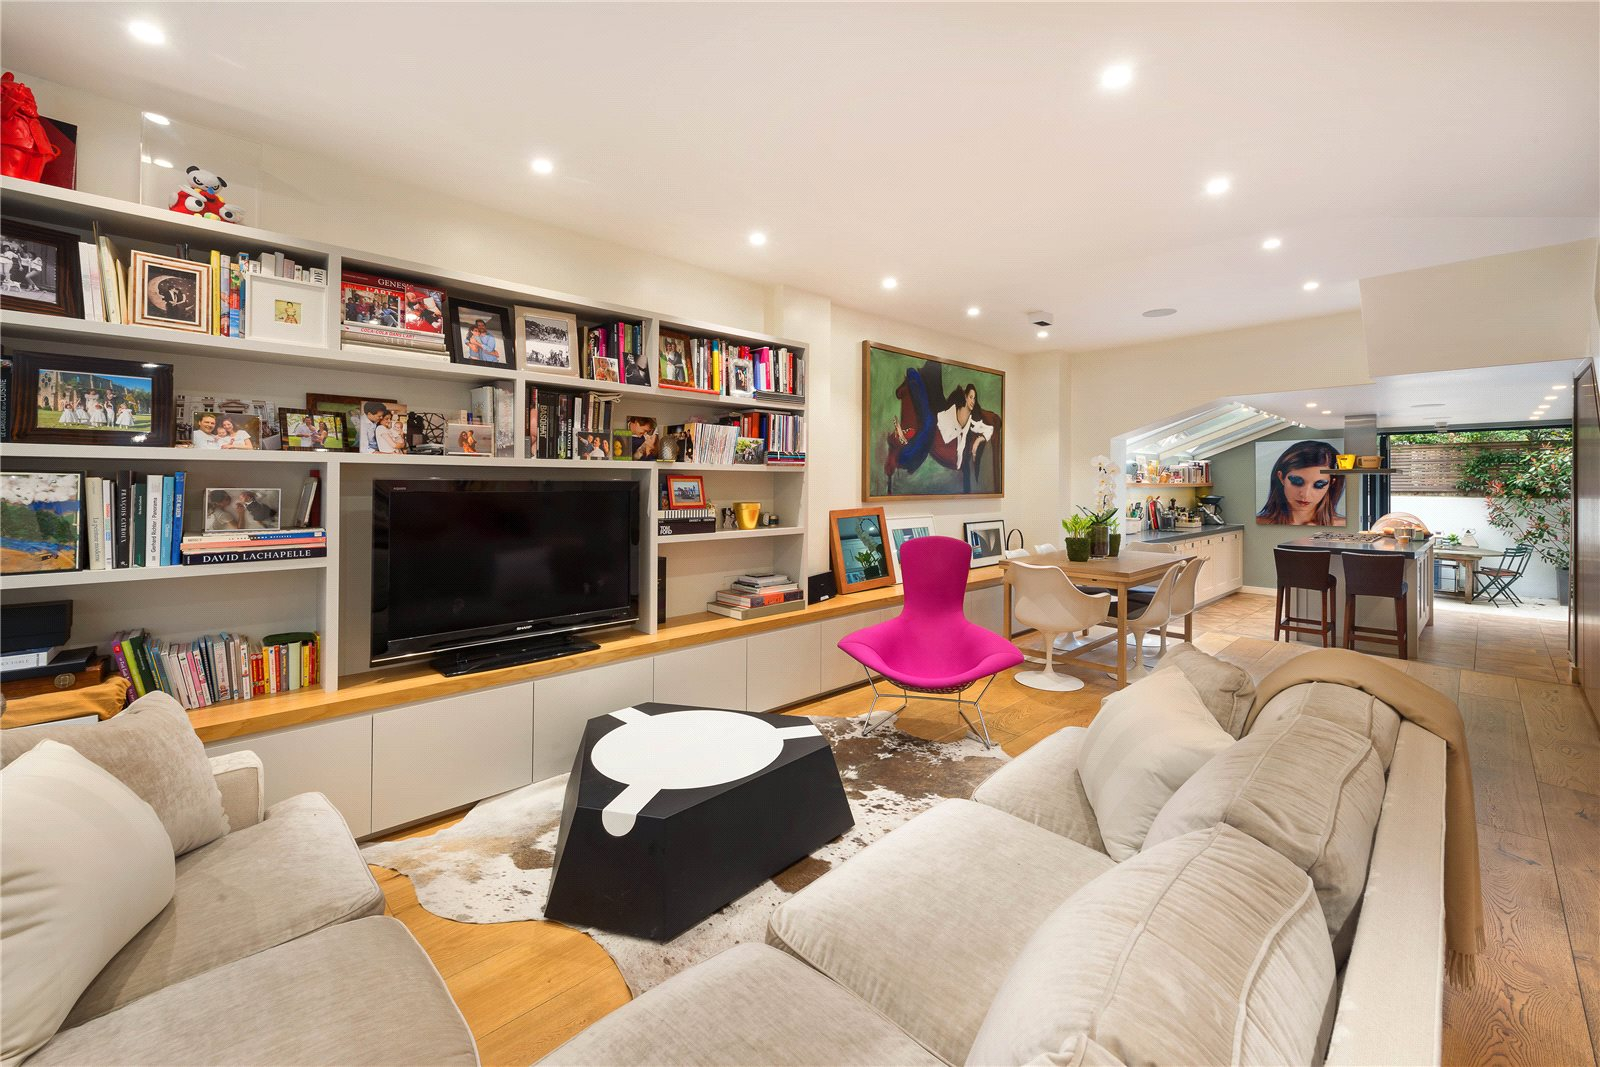 Single Family Home for Sale at Stadium Street, Chelsea, London, SW10 Chelsea, London, England